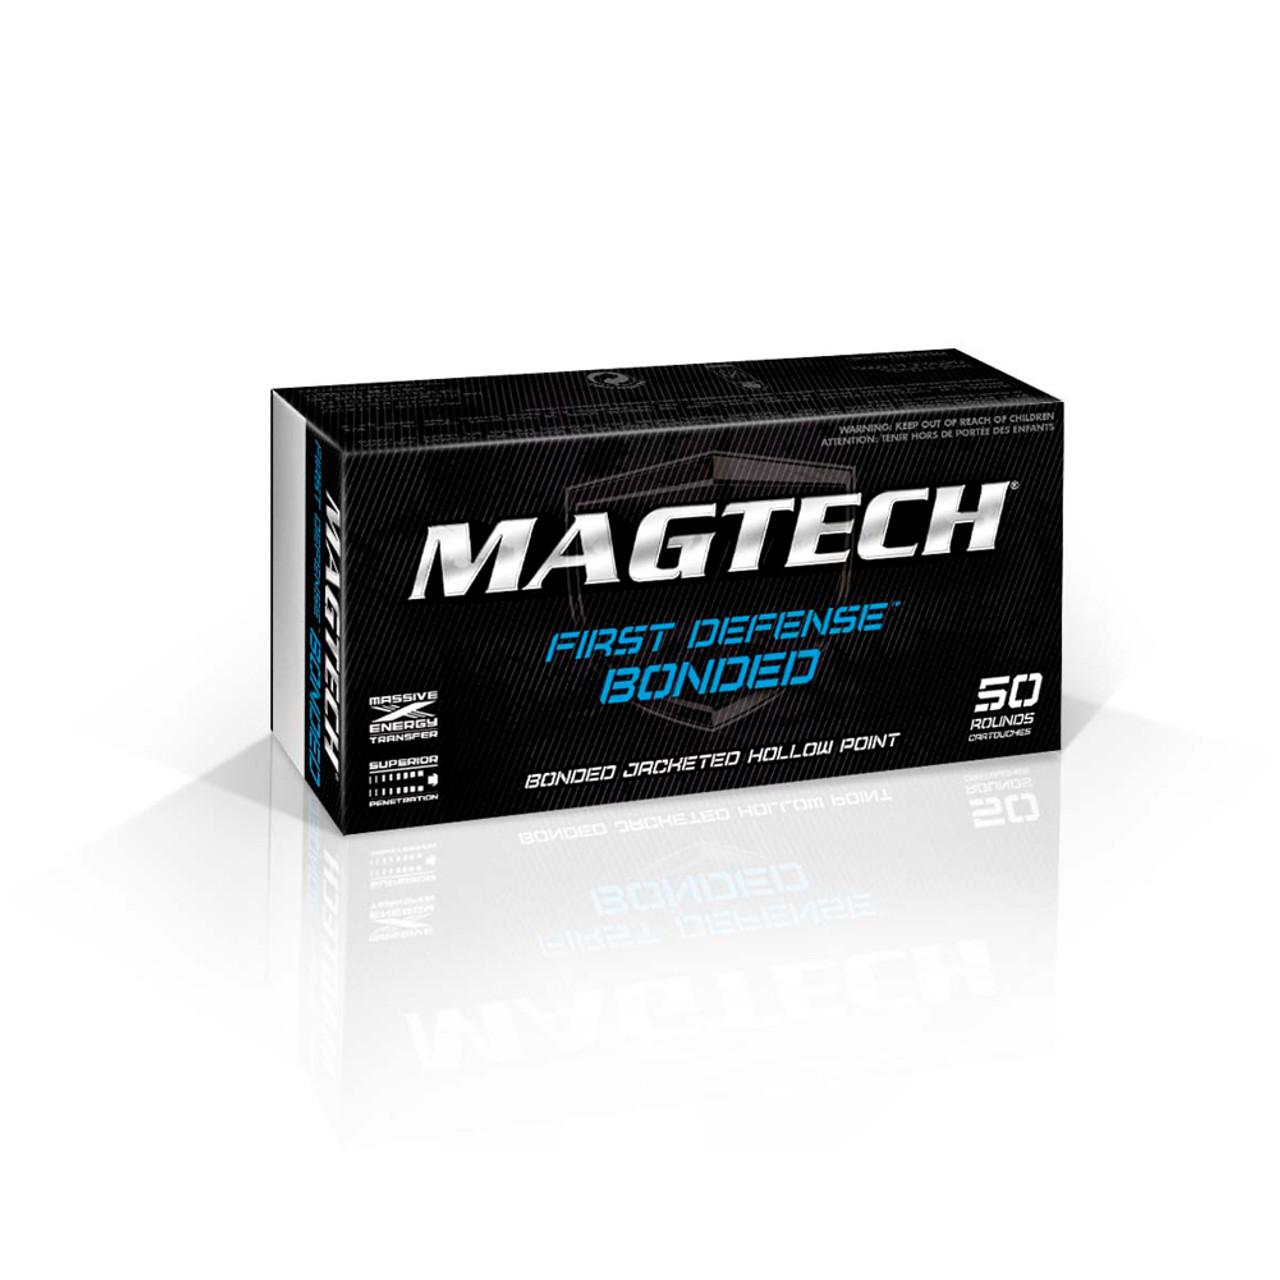 MAGTECH First Defense Bonded 9mm 124 Grain JHP Bonded Ammo, 50 Round Box  (9BONA)